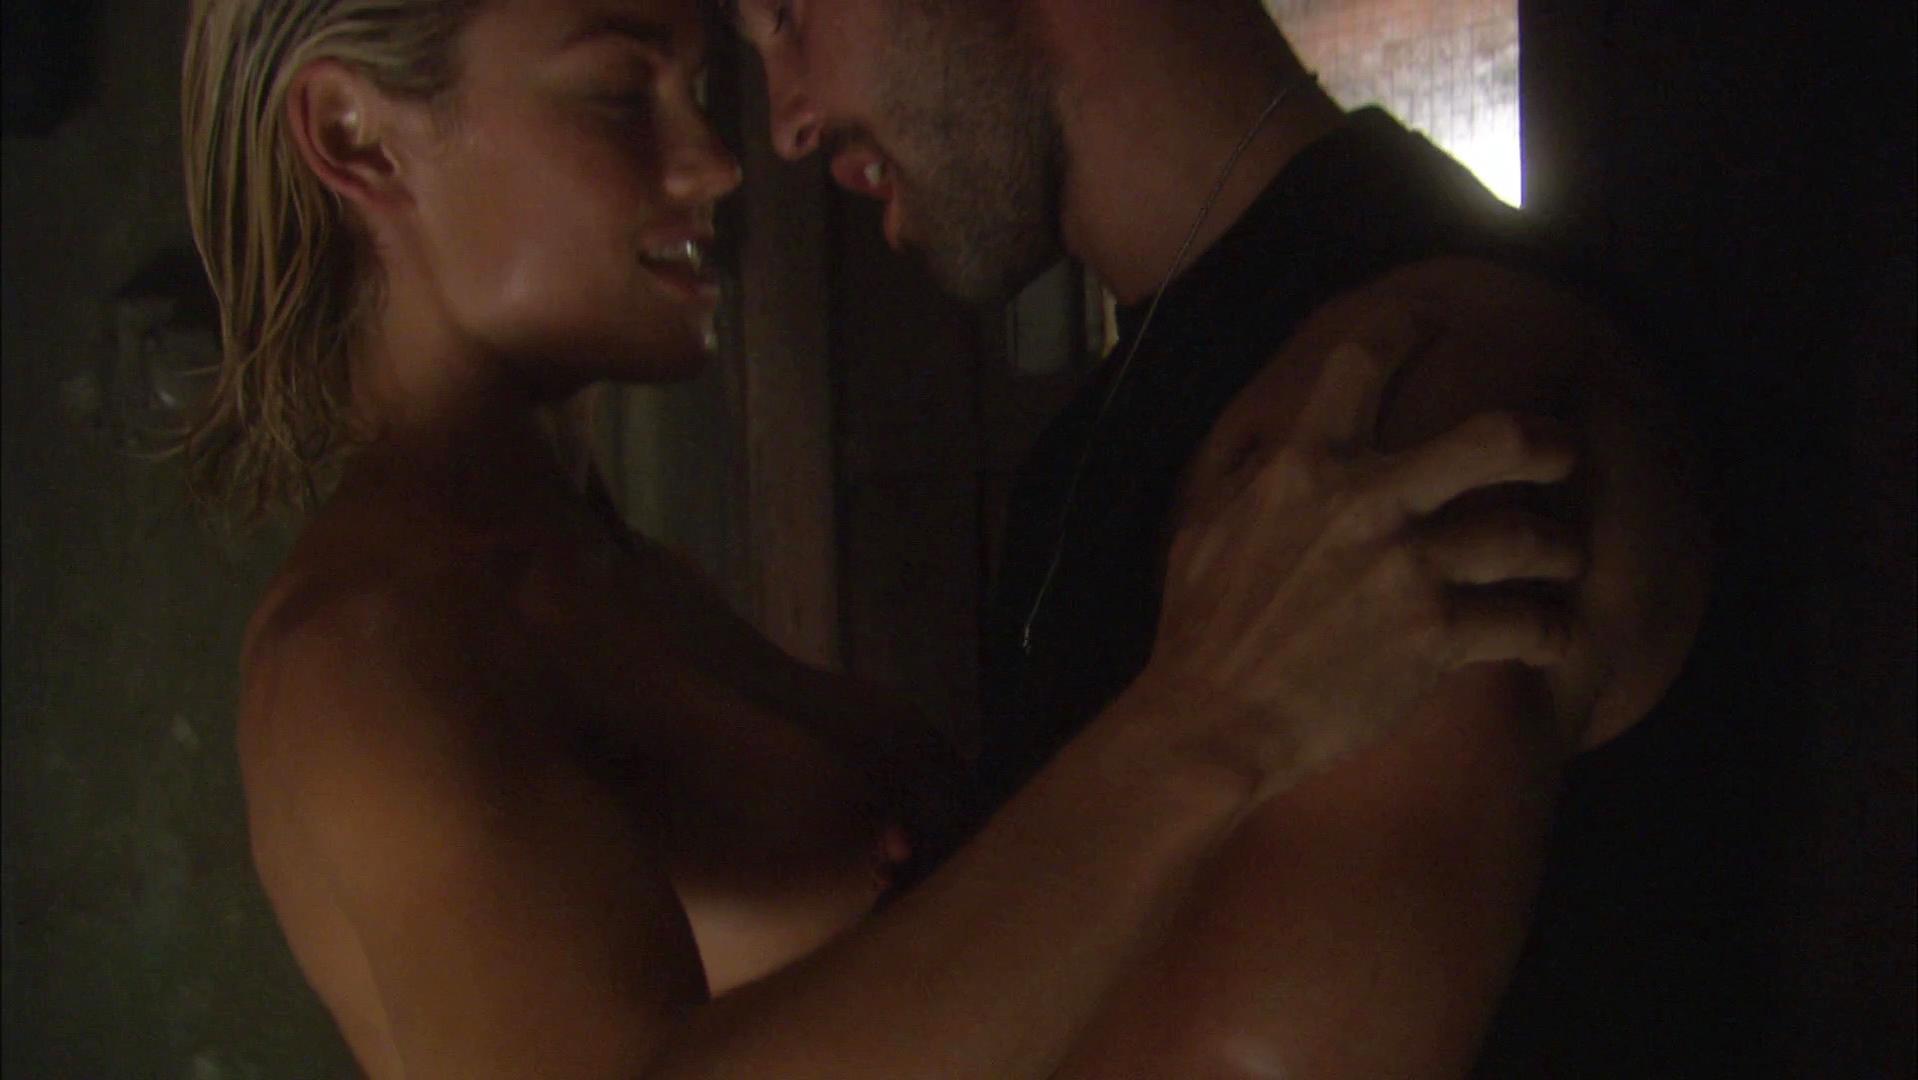 Kelly carlson sex scenes